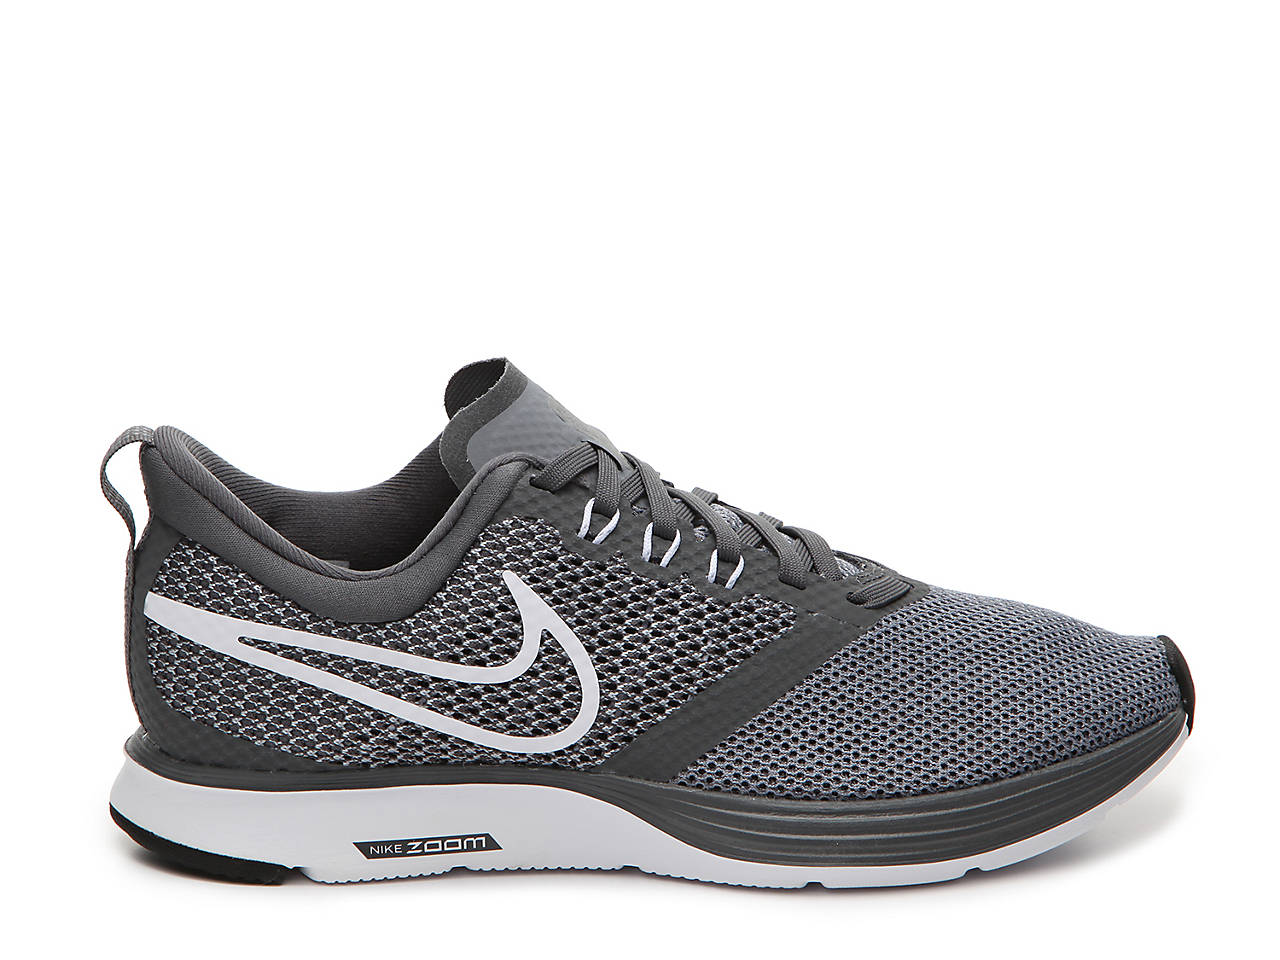 702920c018142 Nike Zoom Strike Lightweight Running Shoe - Women s Women s Shoes